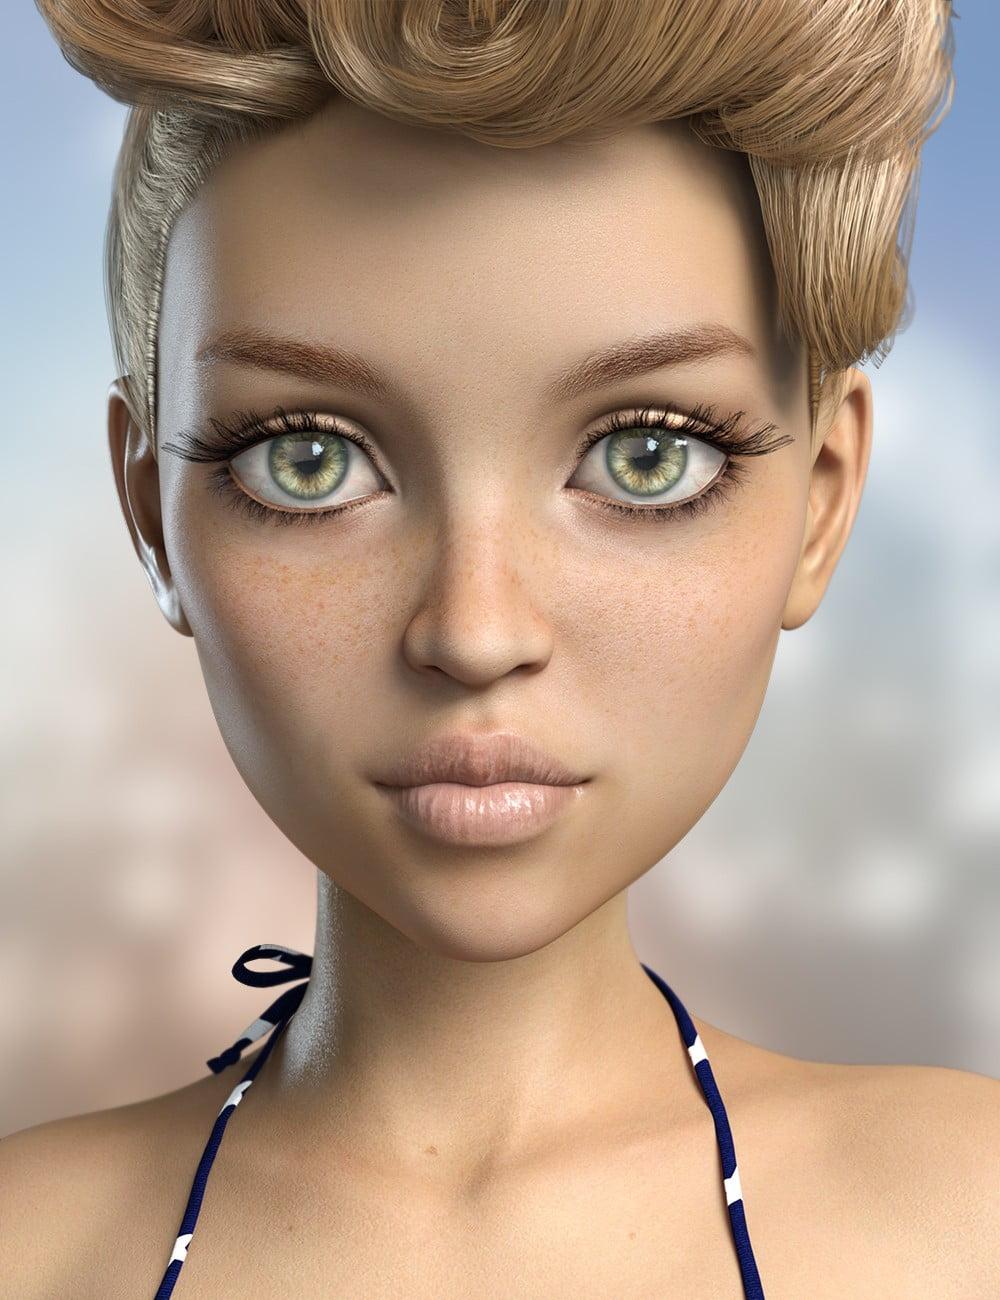 FWSA Lyla for The Girl 8 - character, daz-poser-carrara